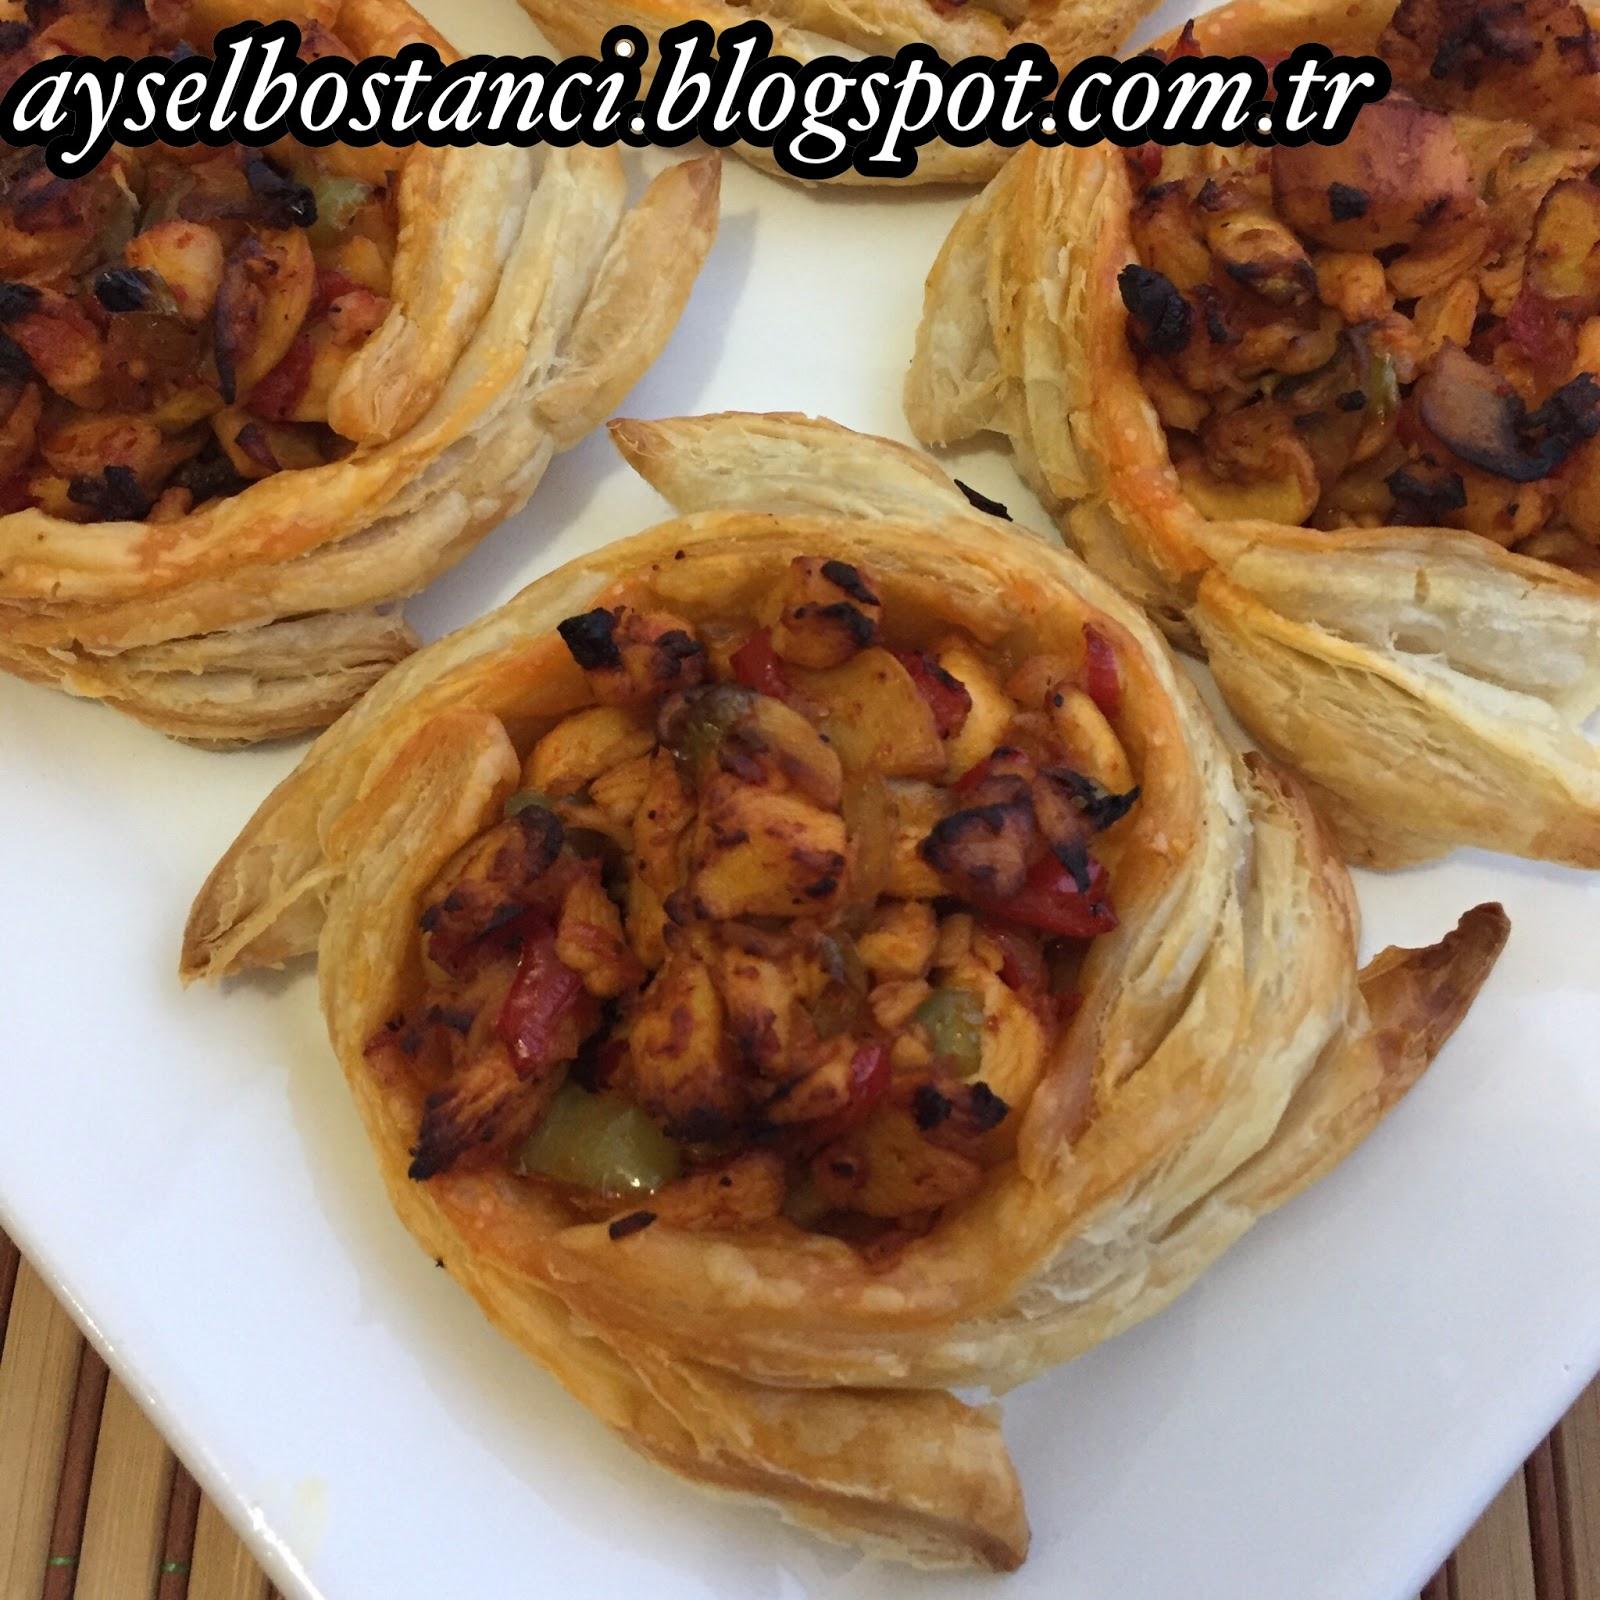 Patlıcanlı Milföy Videosu